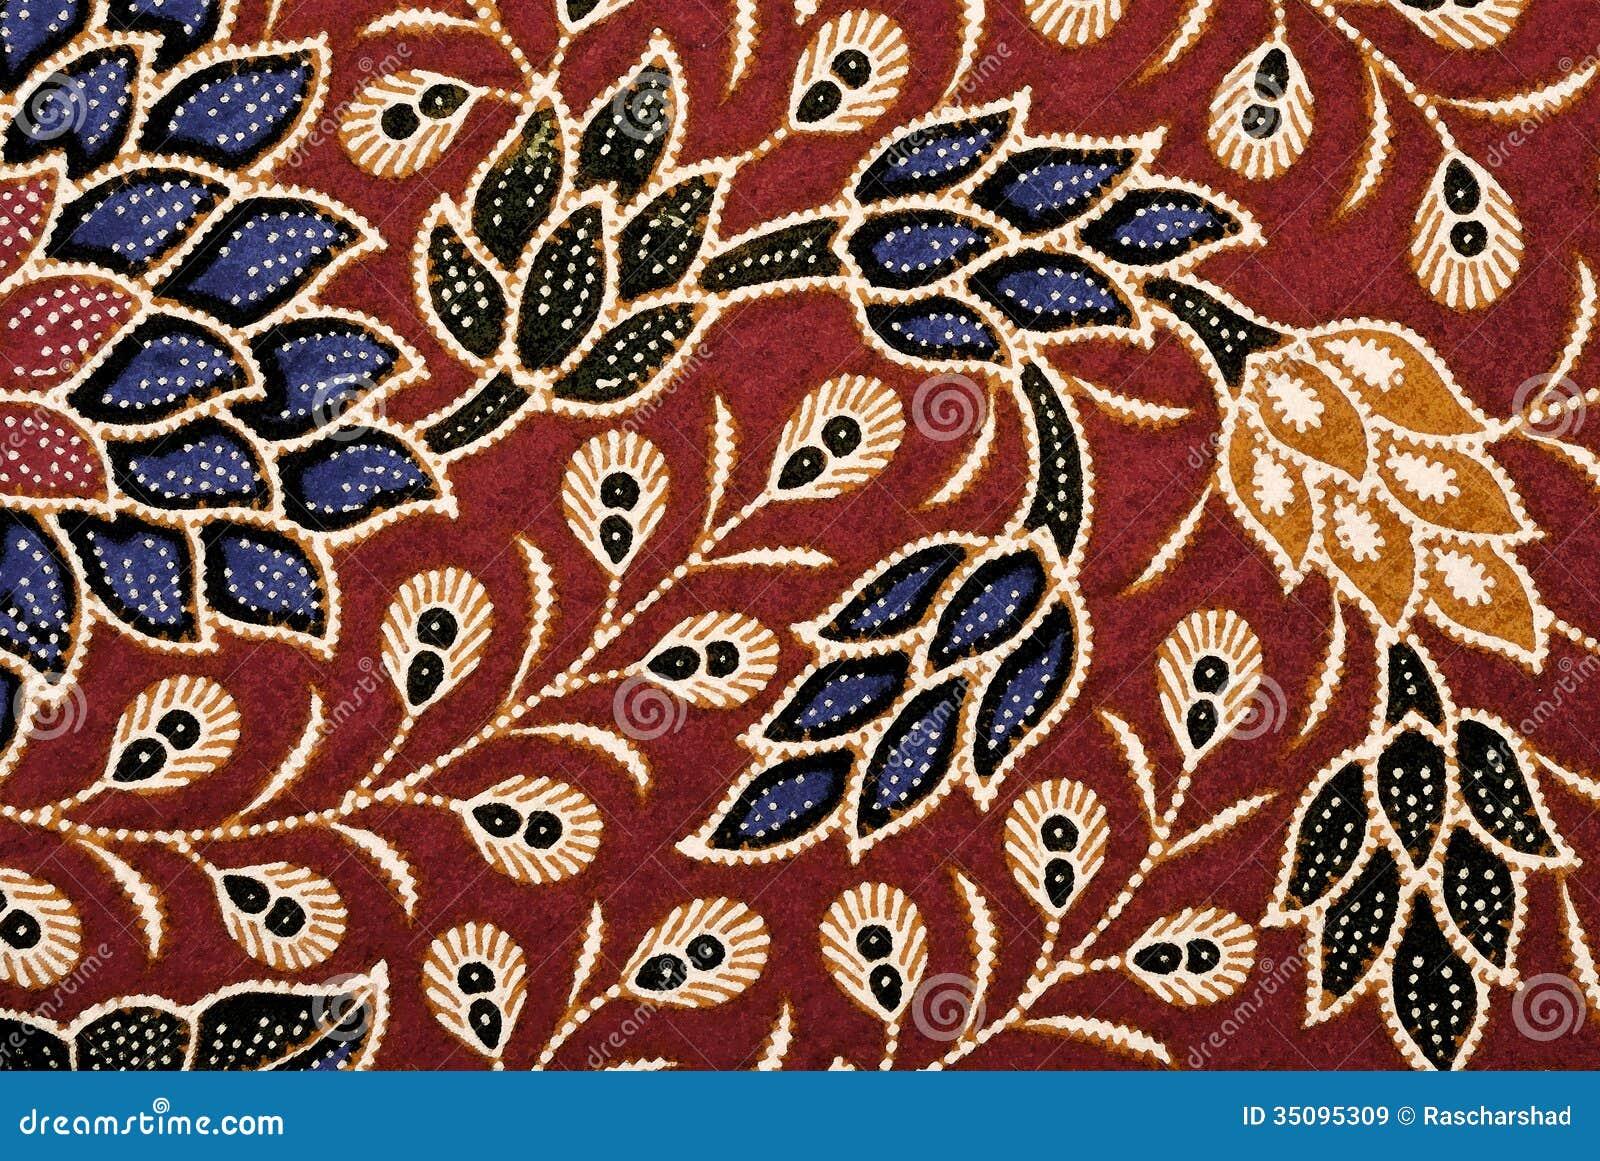 Digital Art Batik Floral Royalty Free Stock Images - Image: 35095309